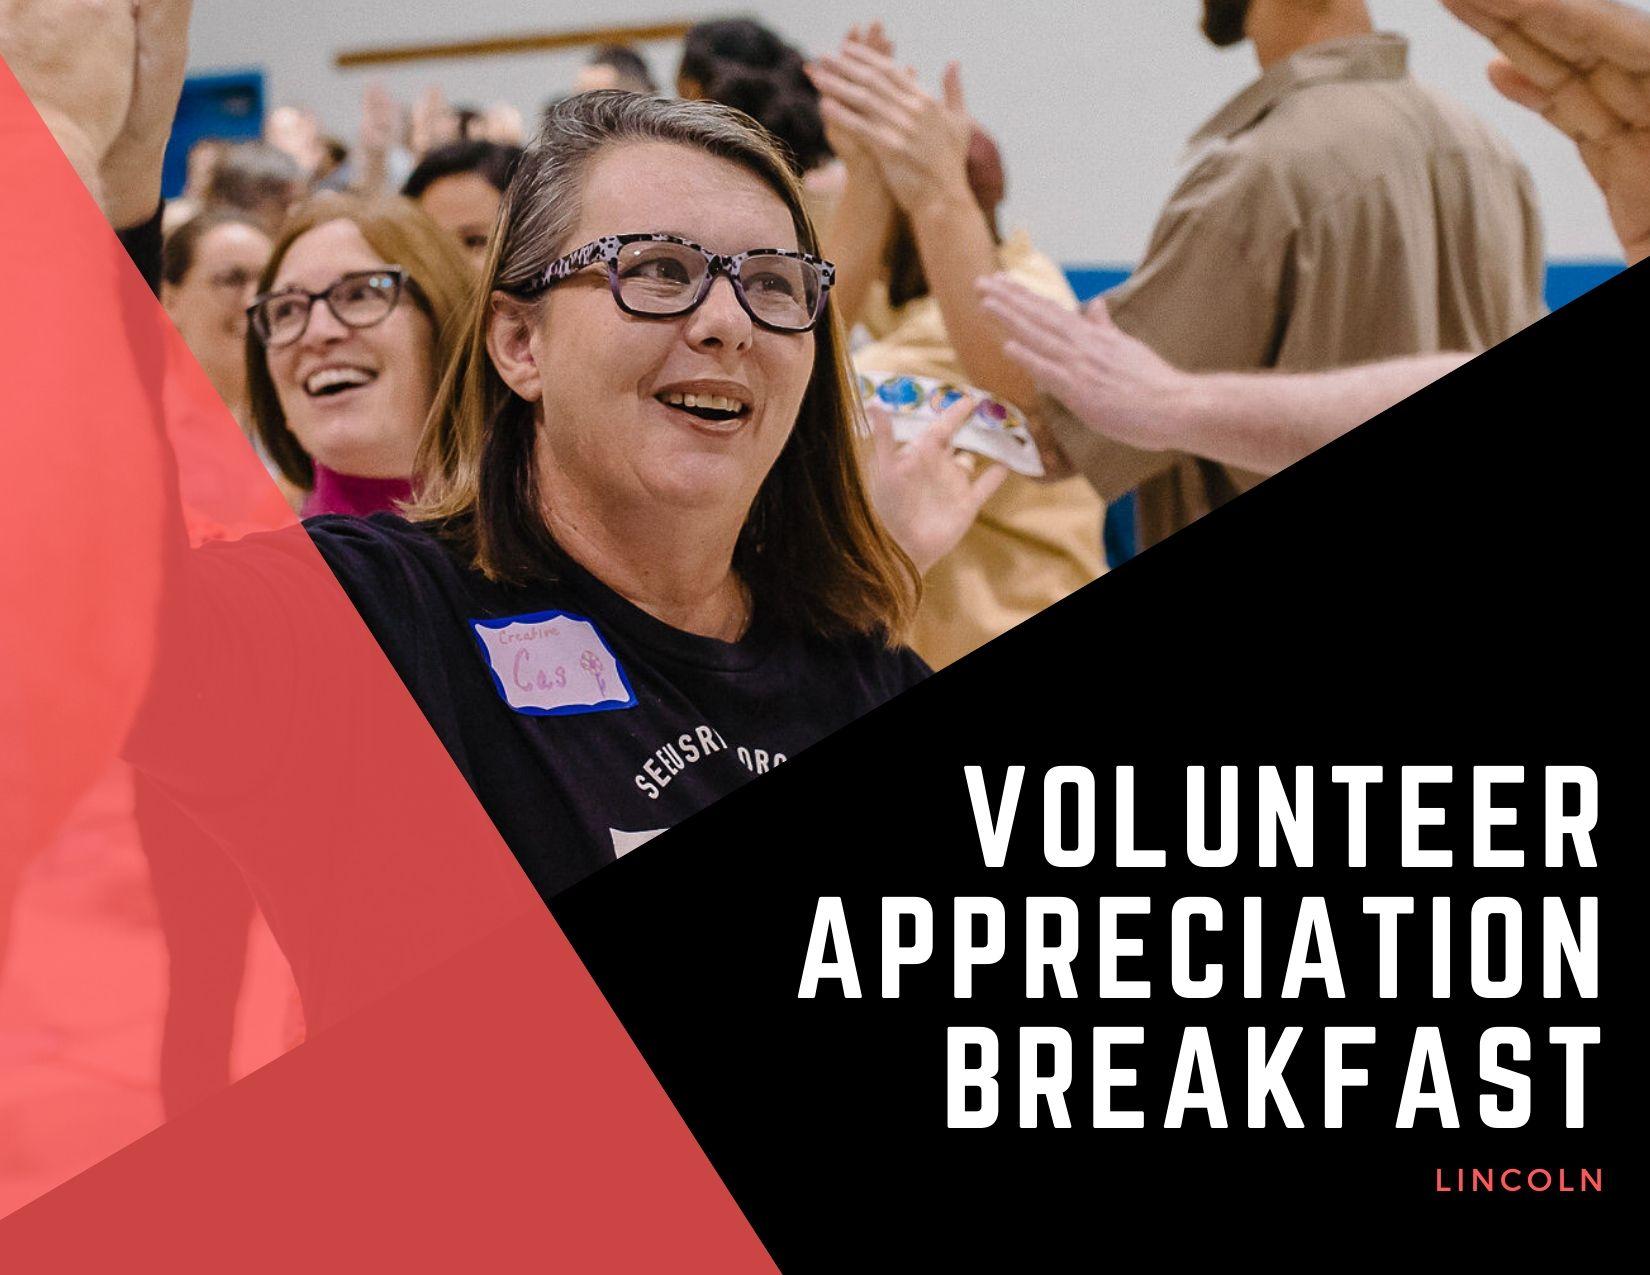 Volunteer Appreciation Breakfast - Lincoln